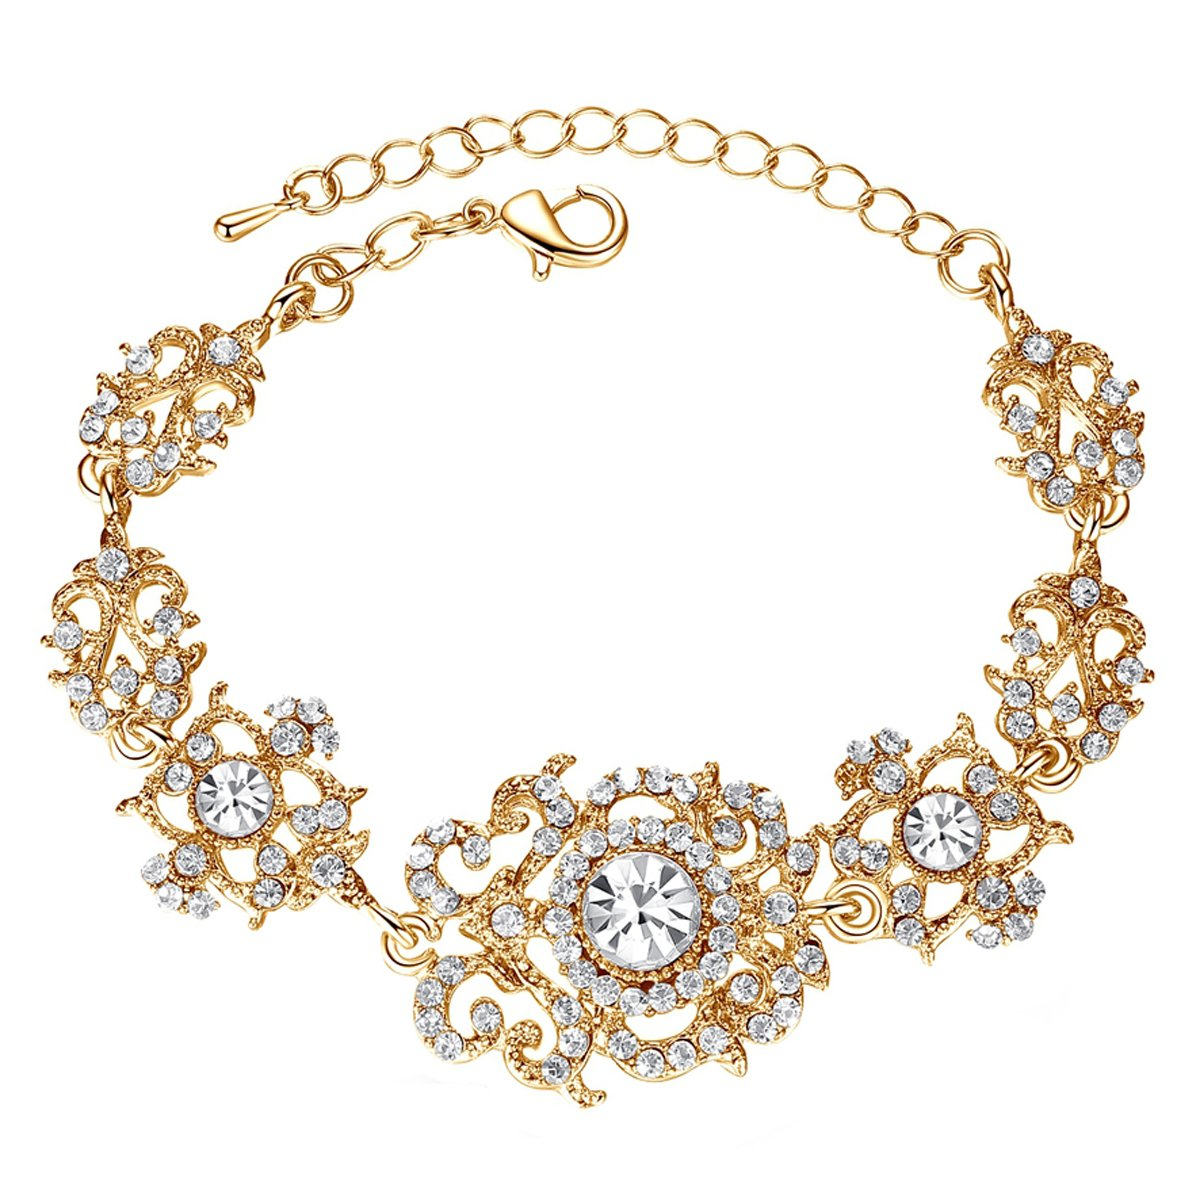 mecresh Gold Color Crystal Rhinestone Wedding Bracelet for Women Brides Bridesmaid …